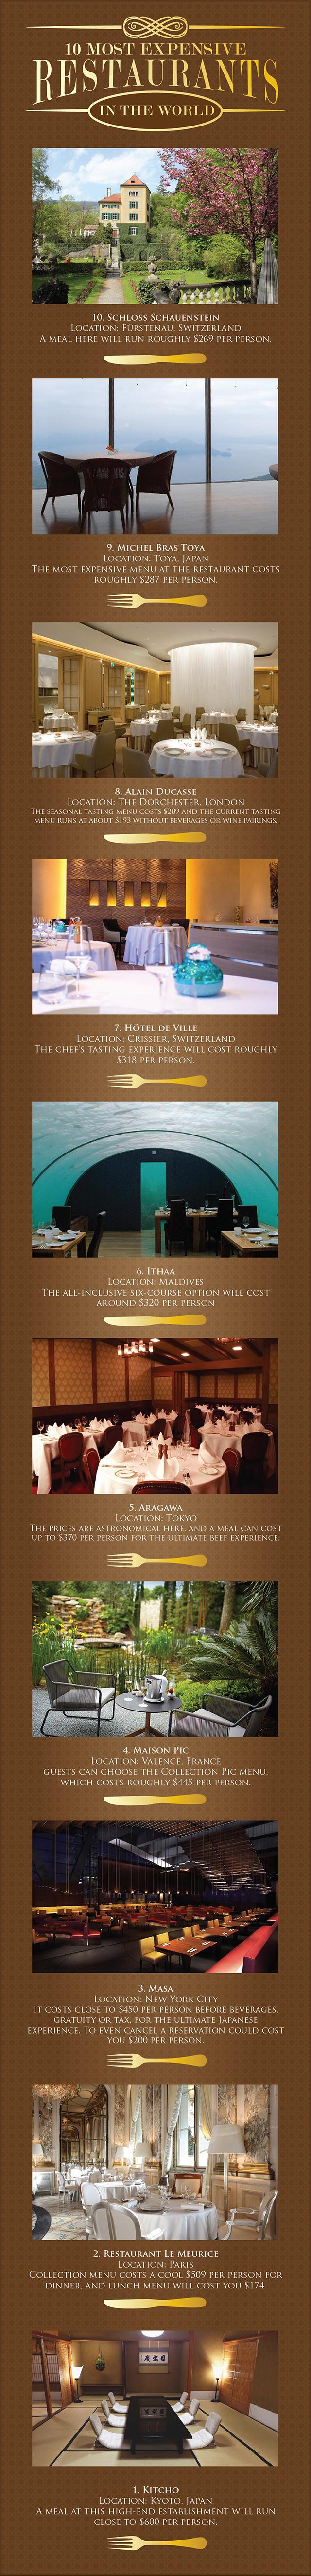 Worlds Most Expensive Luxury Restaurants